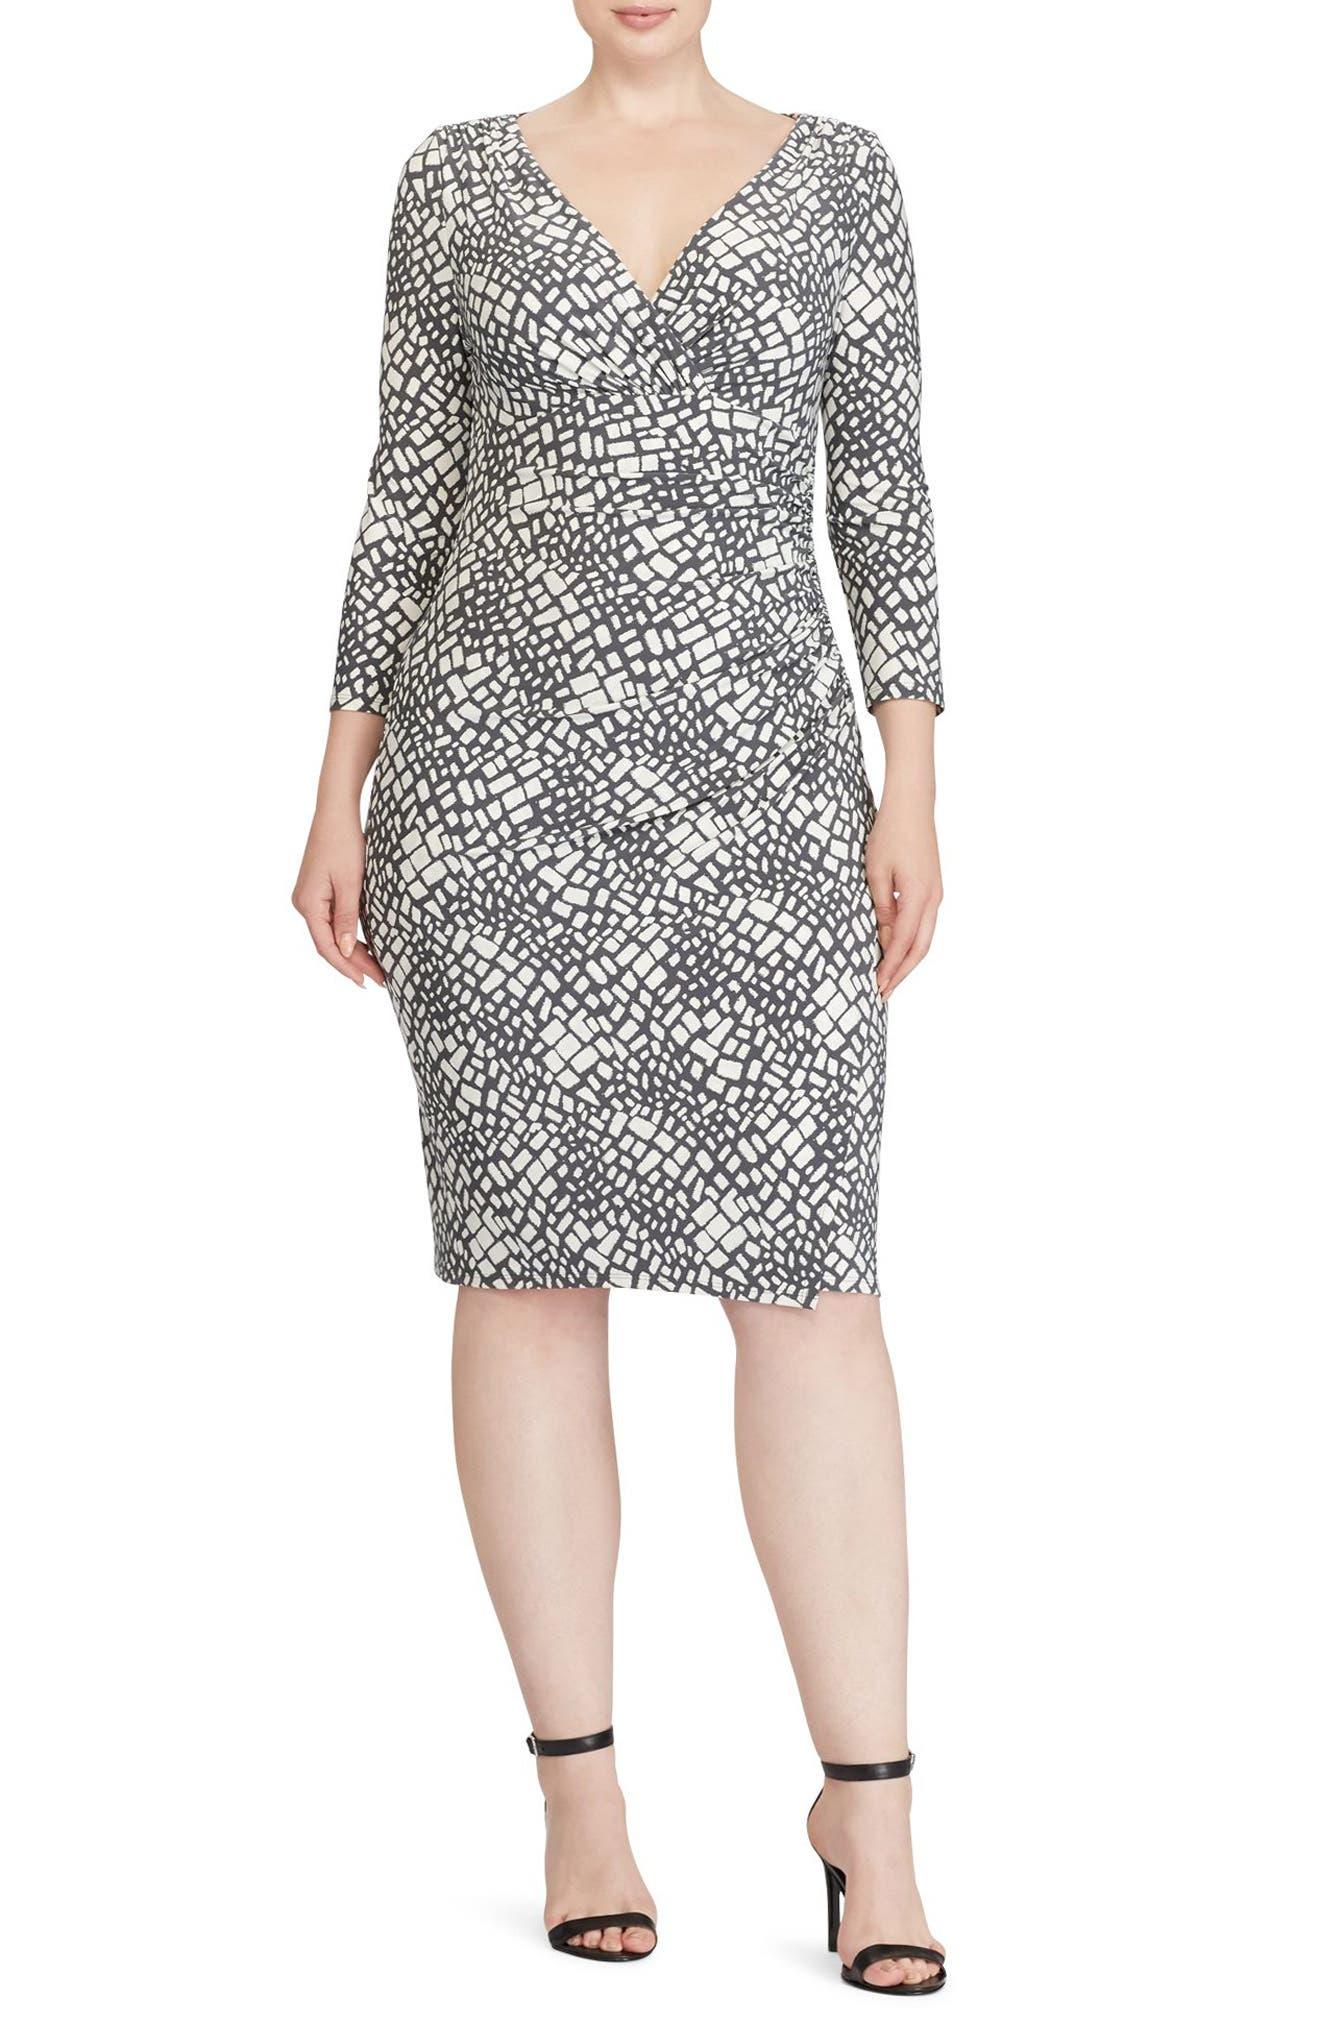 Alternate Image 1 Selected - Lauren Ralph Lauren Shirred Print Jersey Sheath Dress (Plus Size)